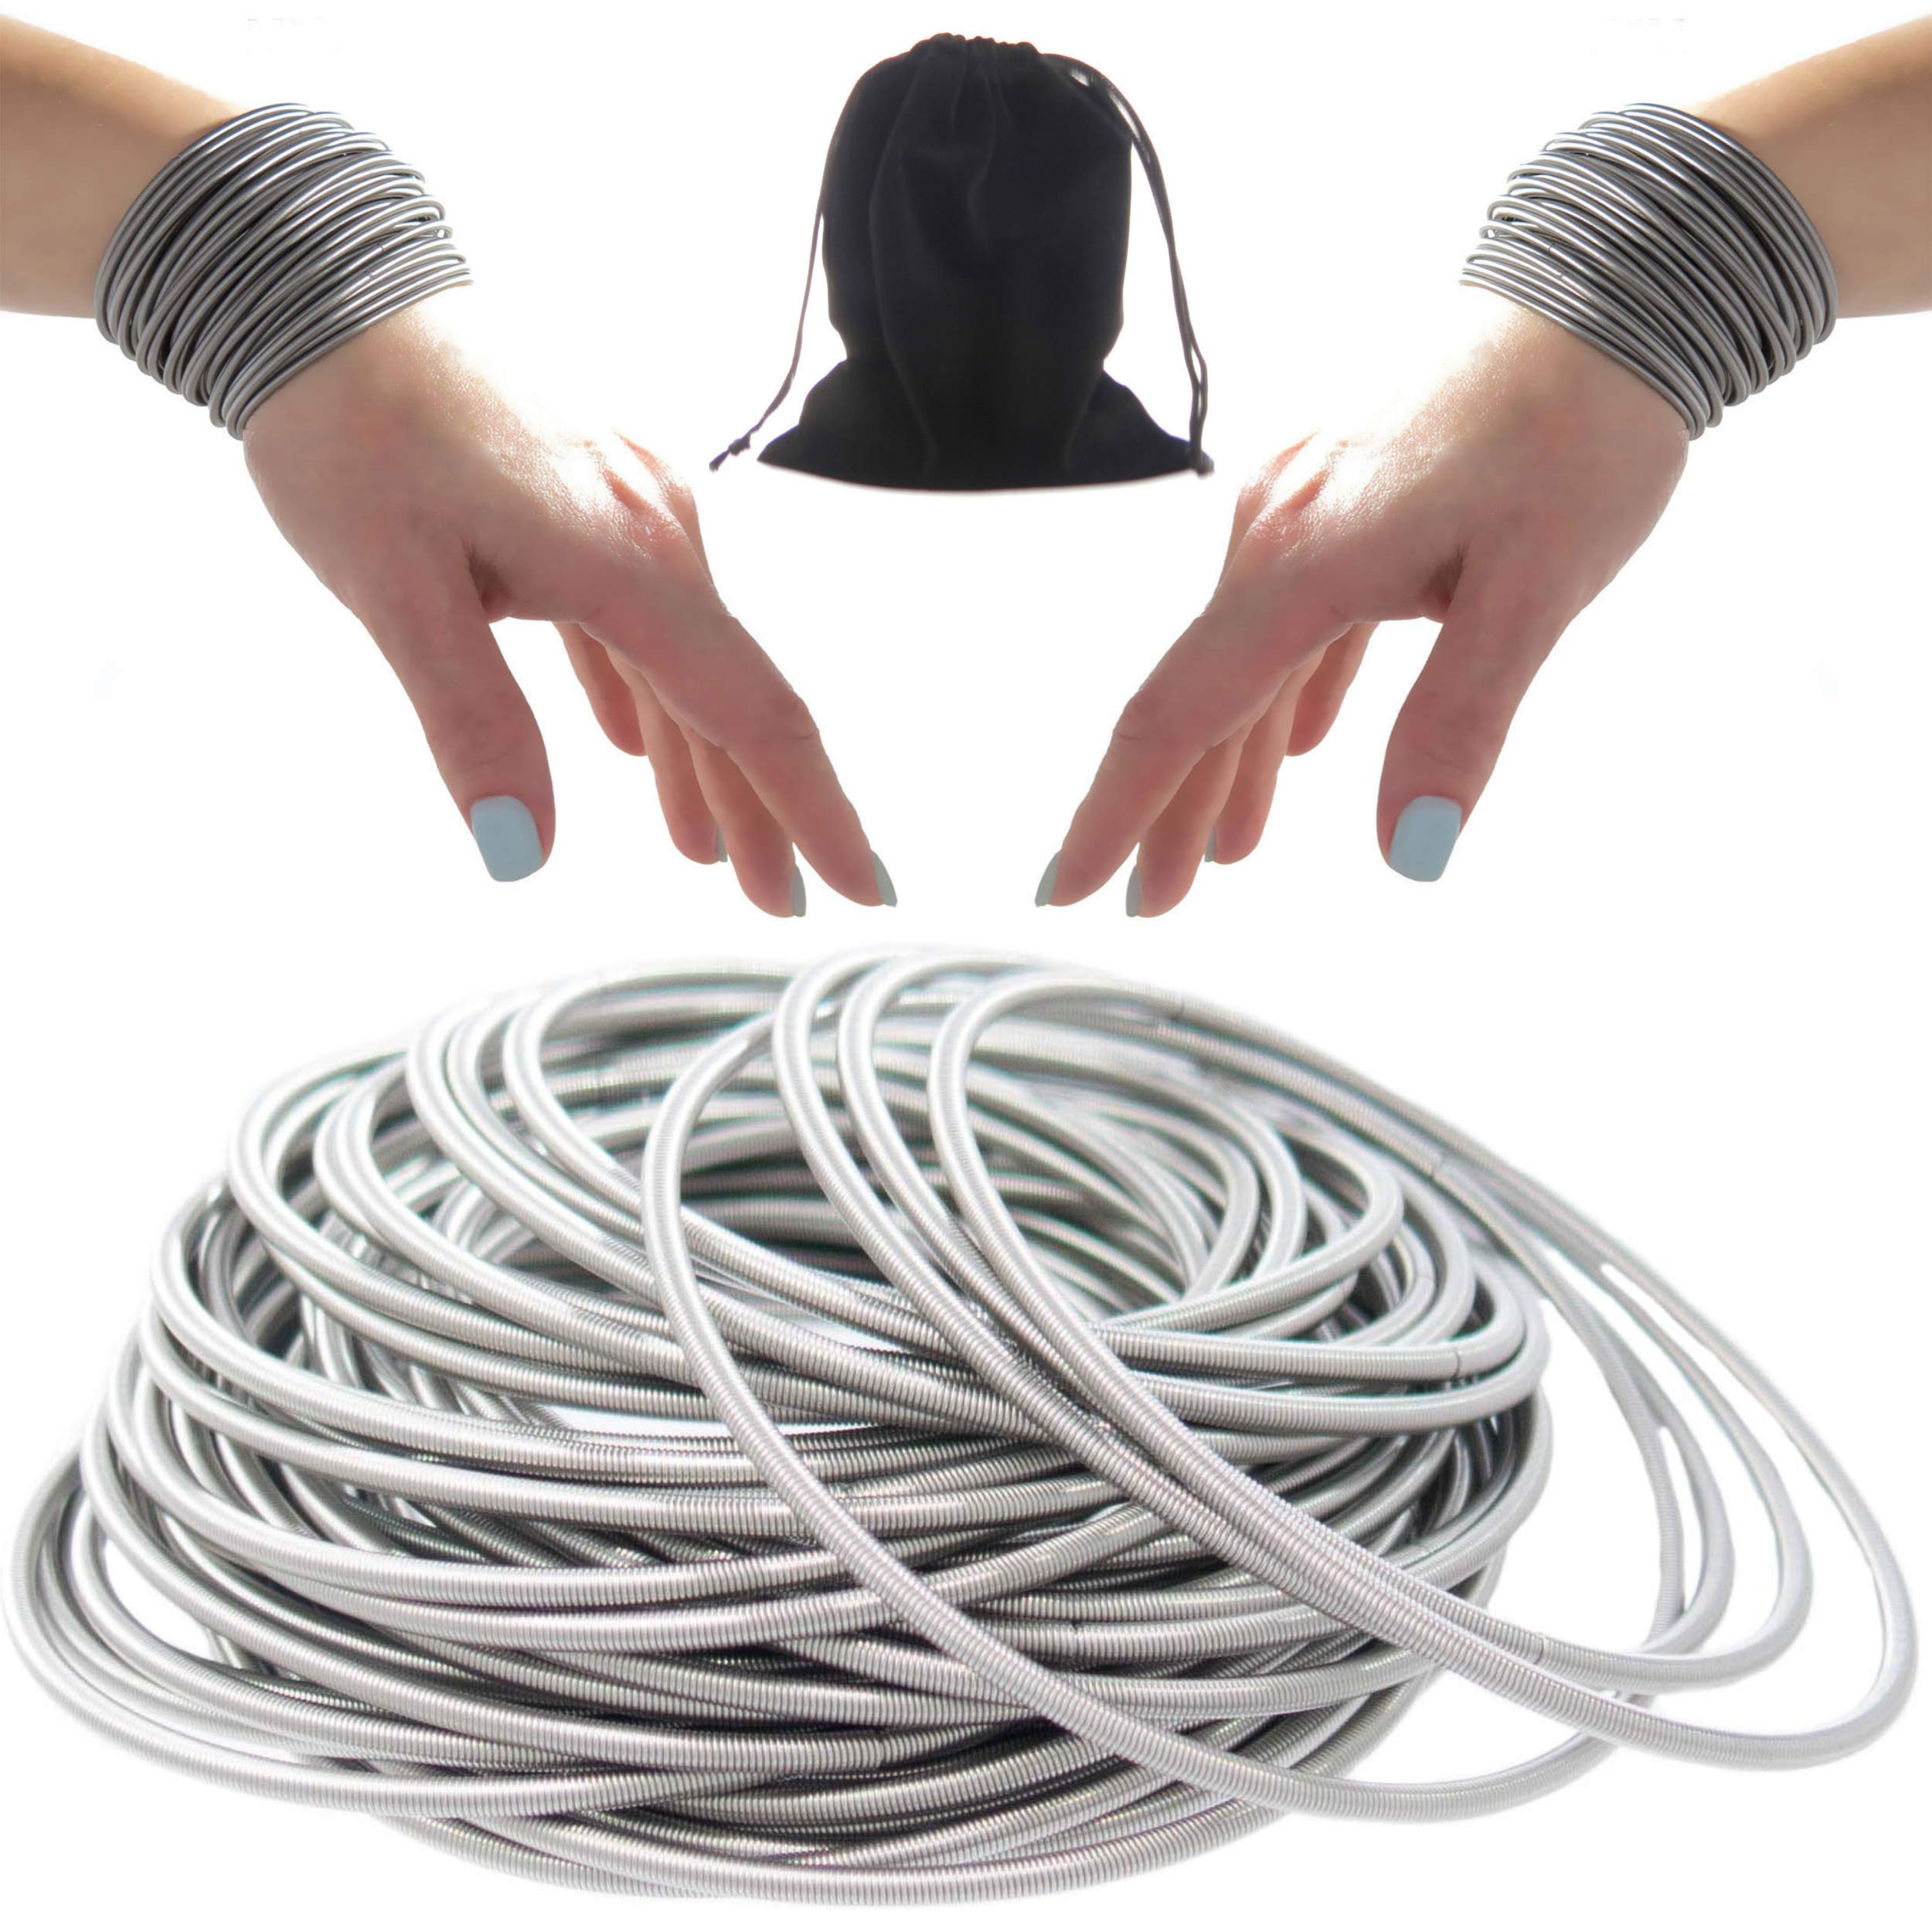 50 PCS Silver Guitar String Bracelet Set, Womans Coil Bracelets, Stackable Stainless Steel Jewelry Bracelets in Velvet Pouch for Women, Spiral Fashion Bangles